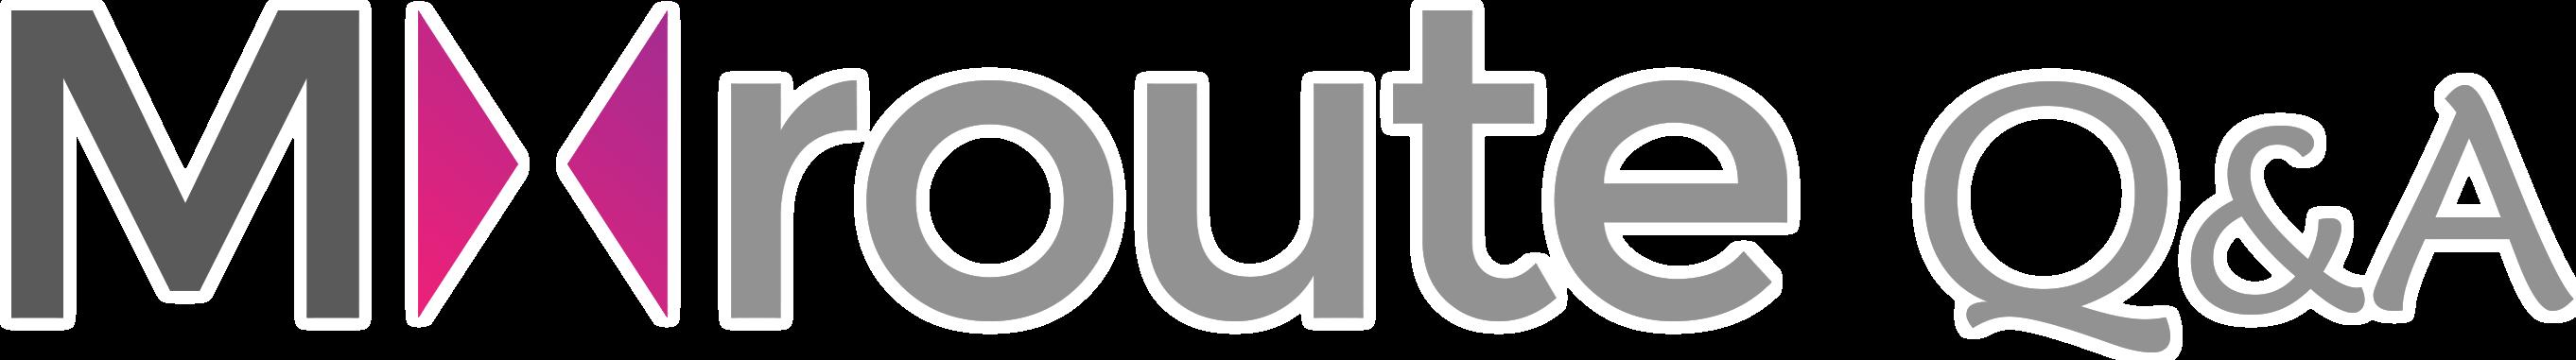 MXroute Q&A